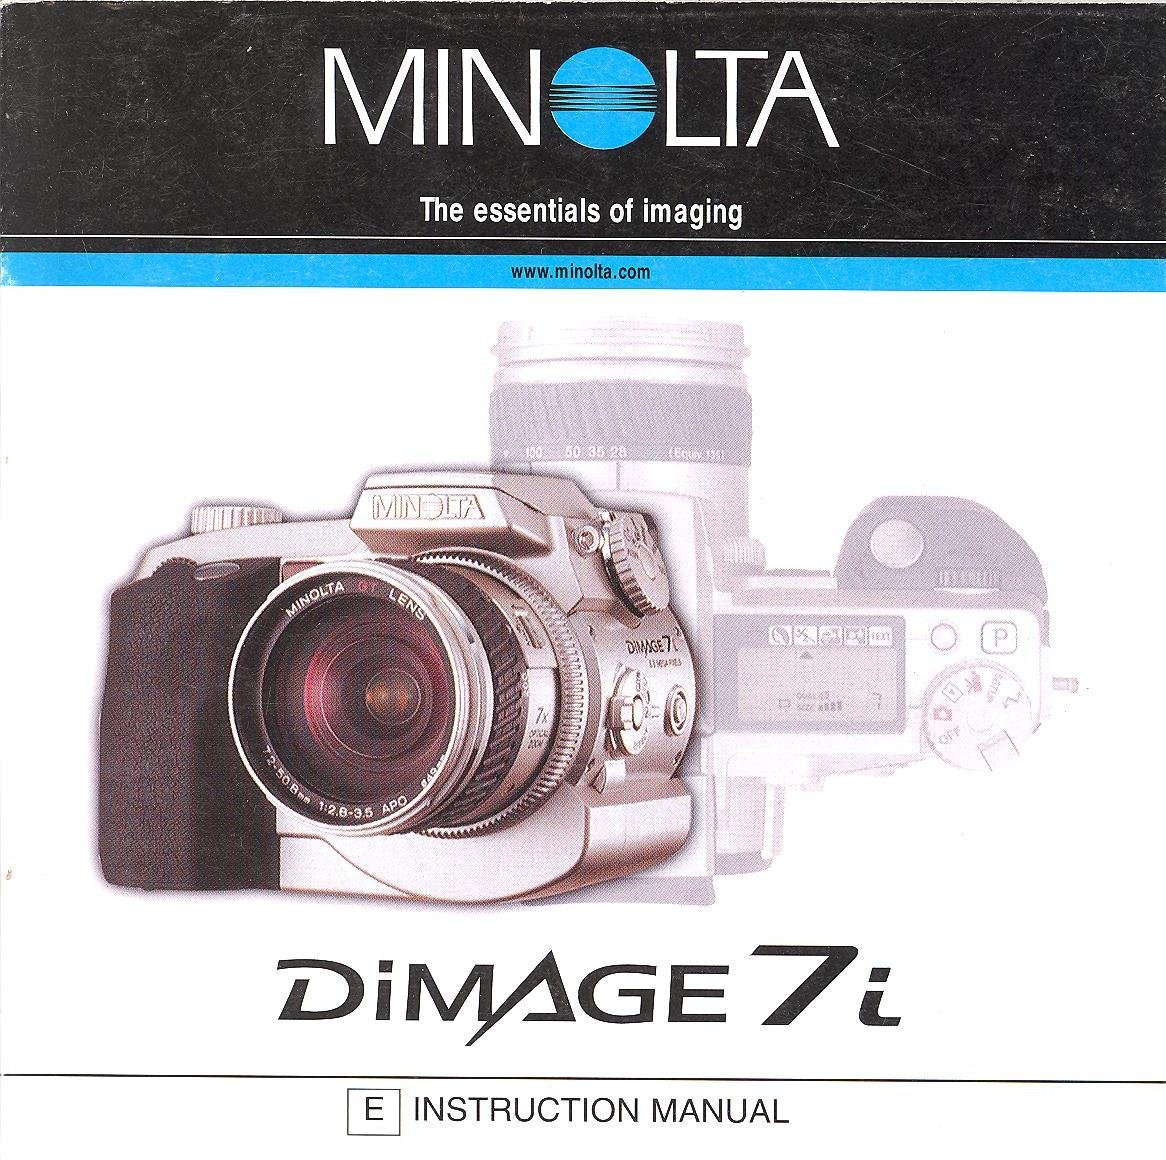 minolta dimage 7i original instruction manual amazon com books rh amazon com Minolta SRT 101 Minolta Raw